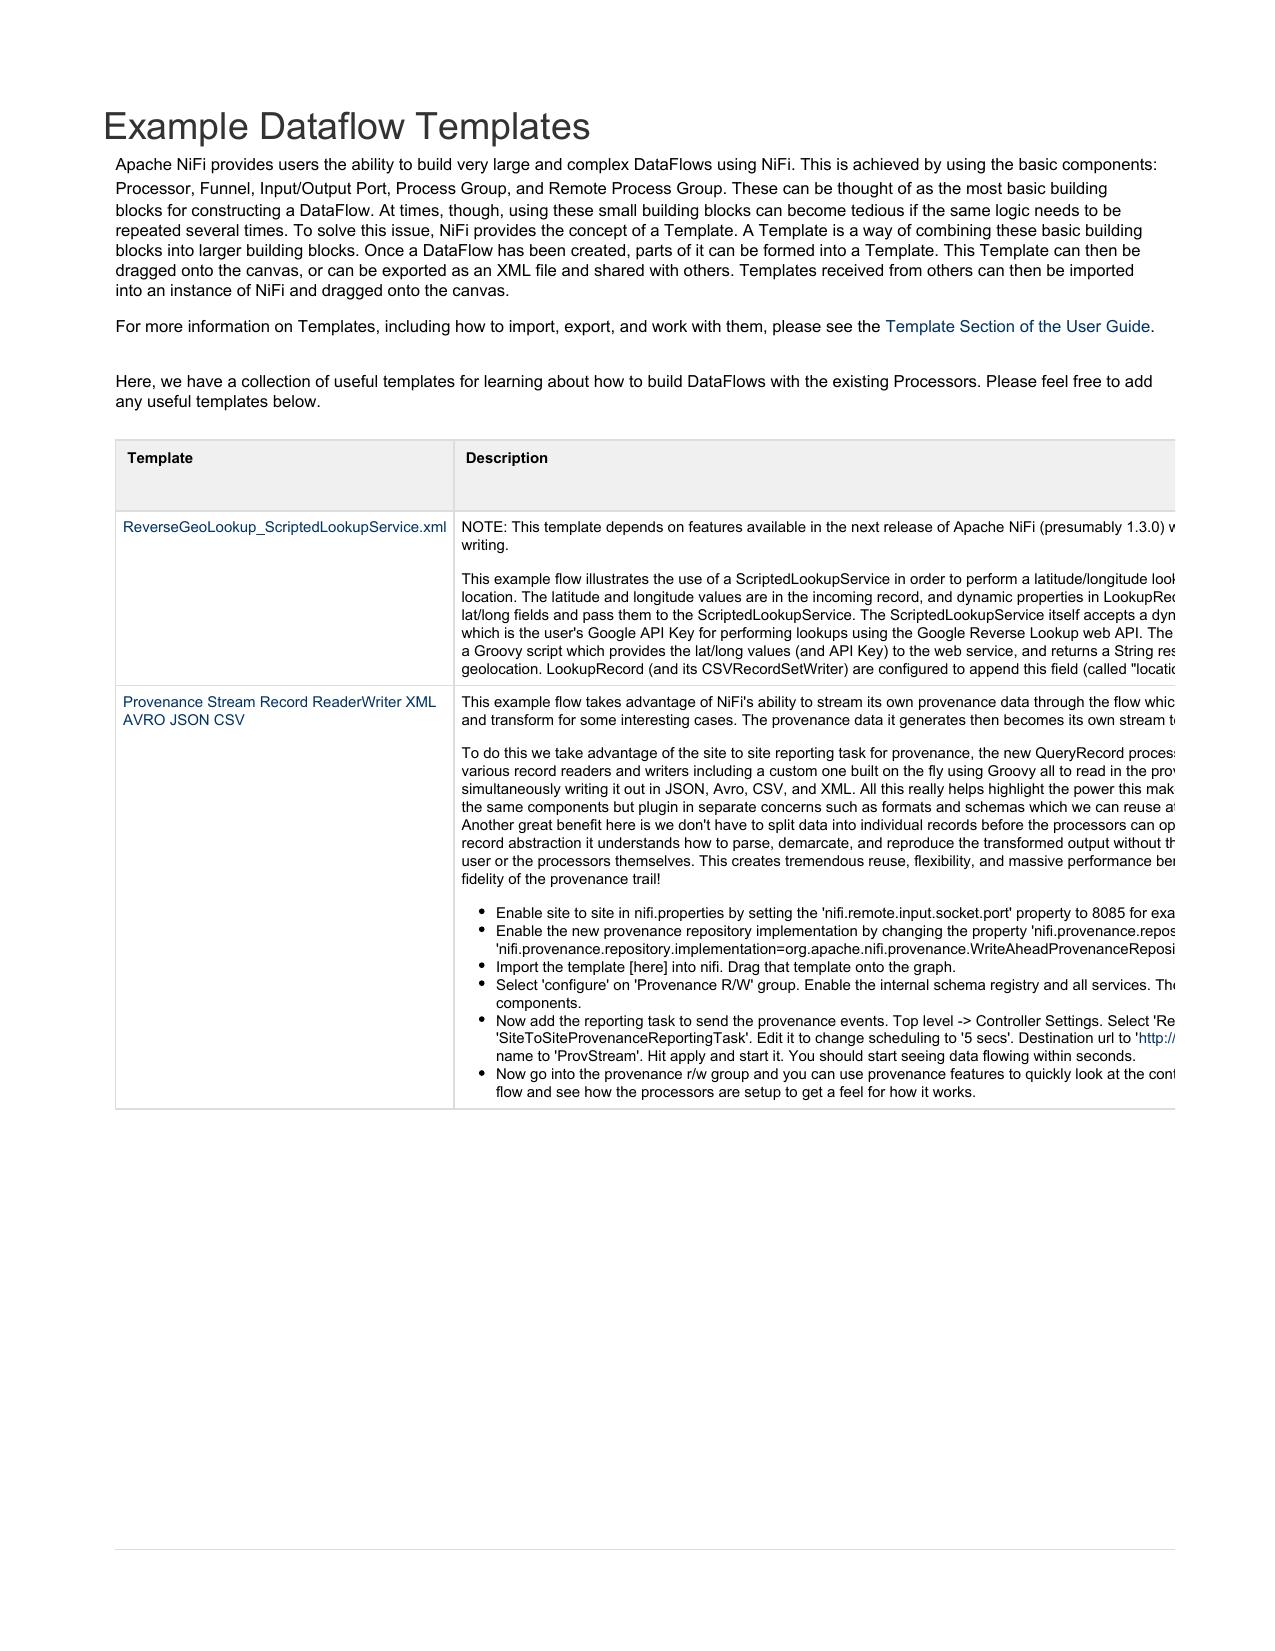 Example Dataflow Templates | manualzz com